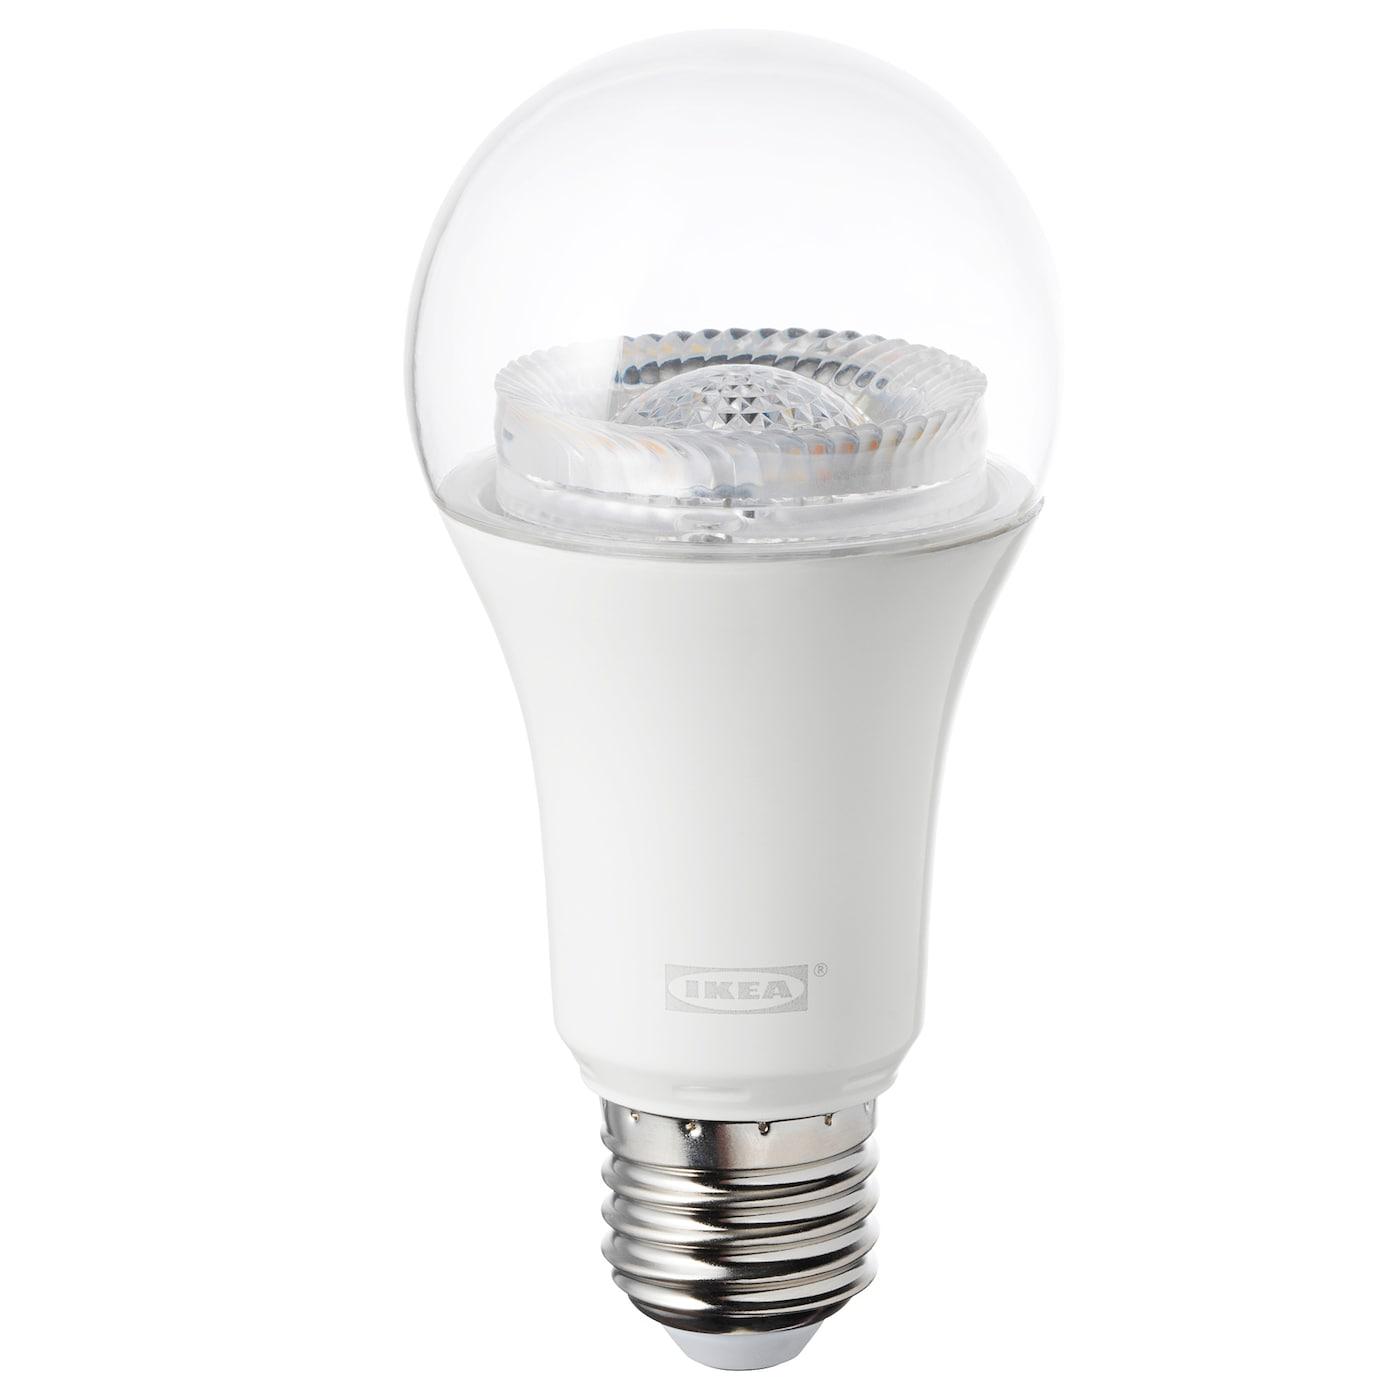 Smart Lighting Wireless Remote Control Ikea 3 Switch Light Fitting Trdfri Led Bulb E27 950 Lumen